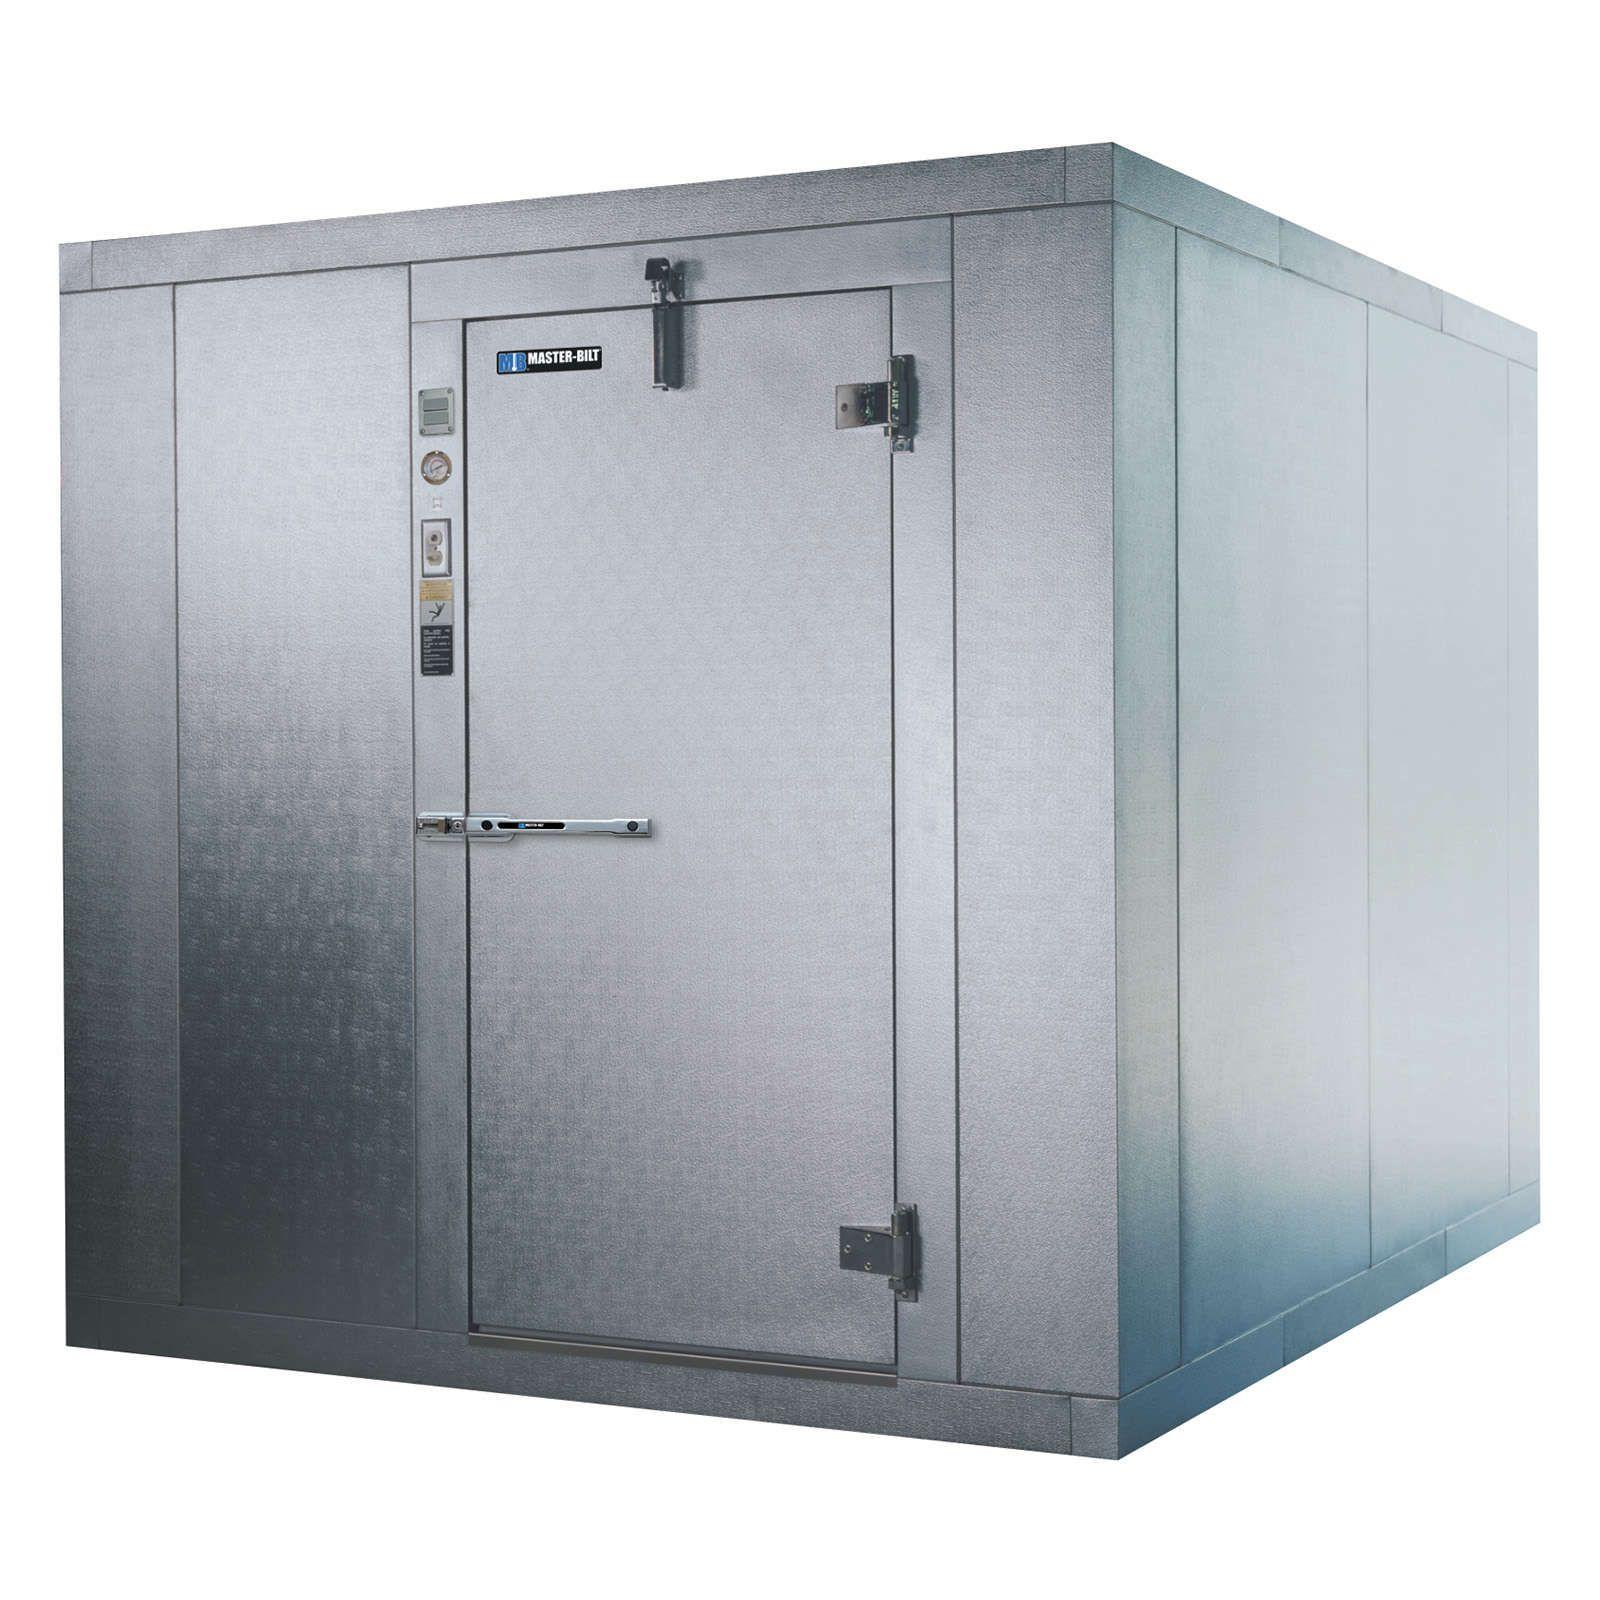 Master Bilt 760812fx Quick Ship Cooler Freezer Combination Walk In 7 9 Walk In Freezer Commercial Freezer Commercial Kitchen